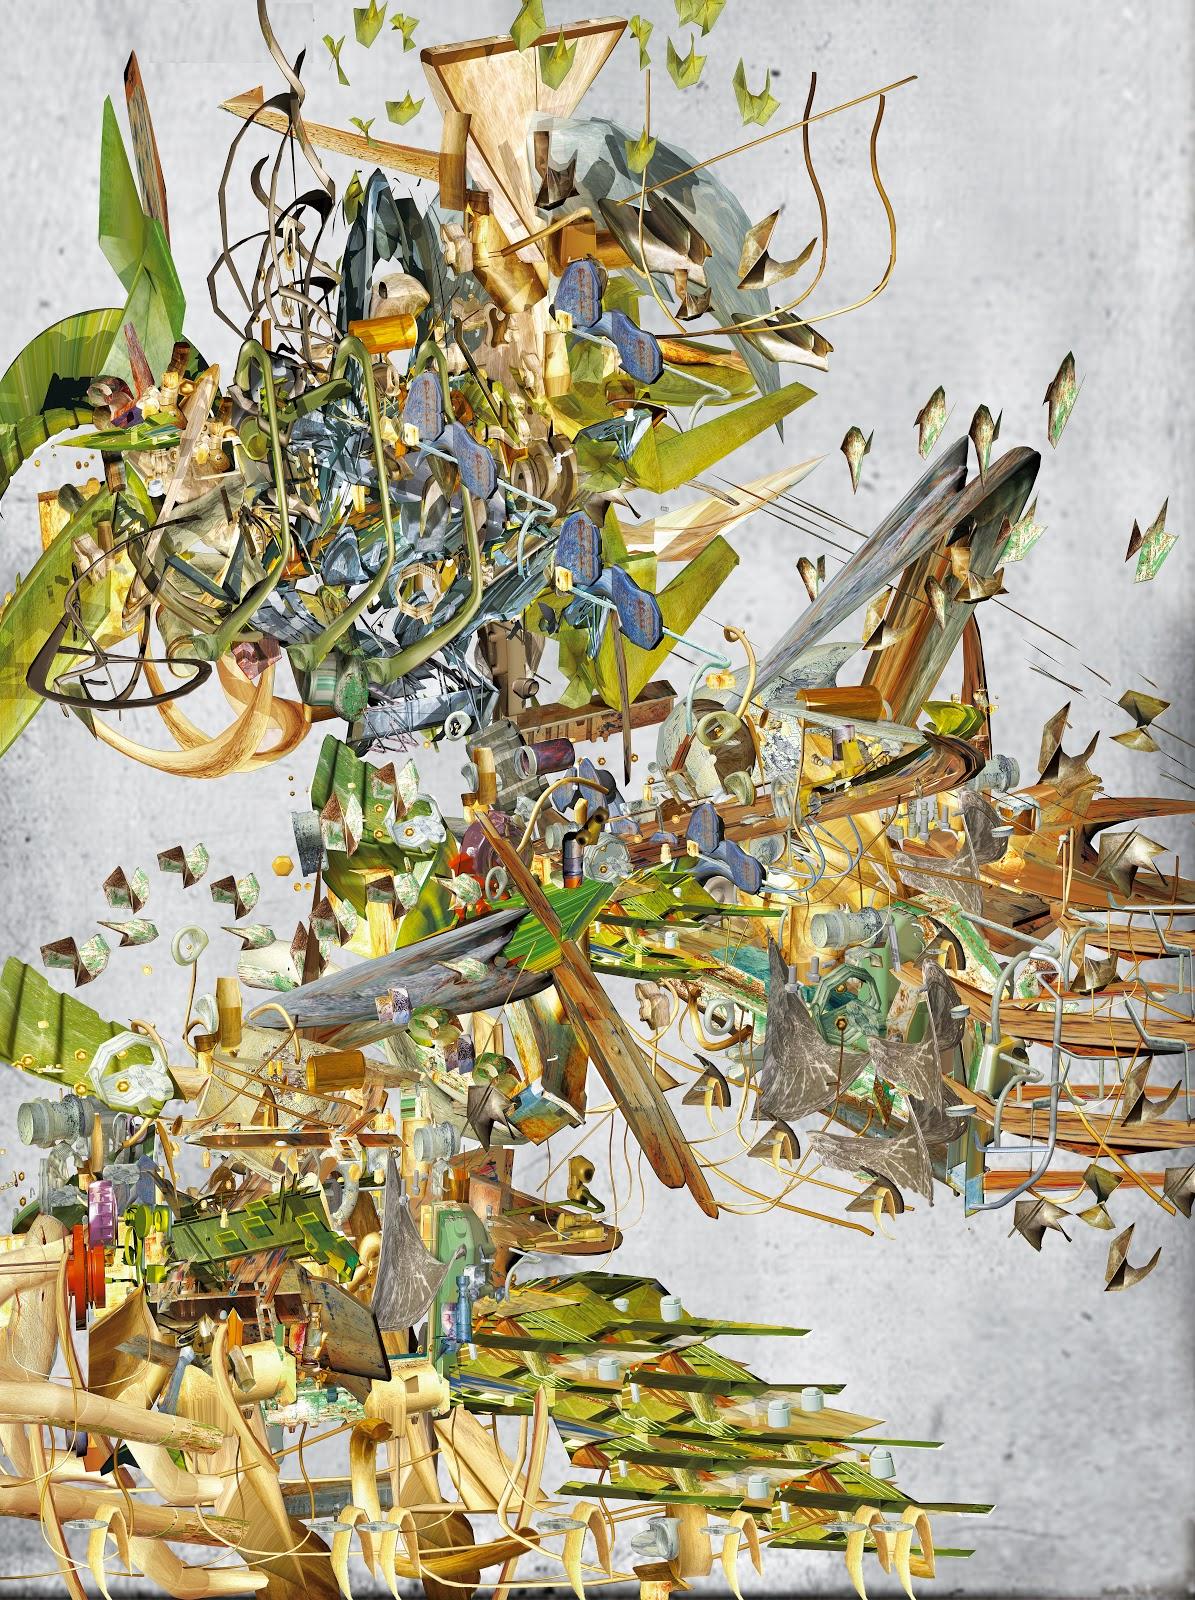 ryota-matsumoto-finalist-artcompetiiton-reartiste.jpg